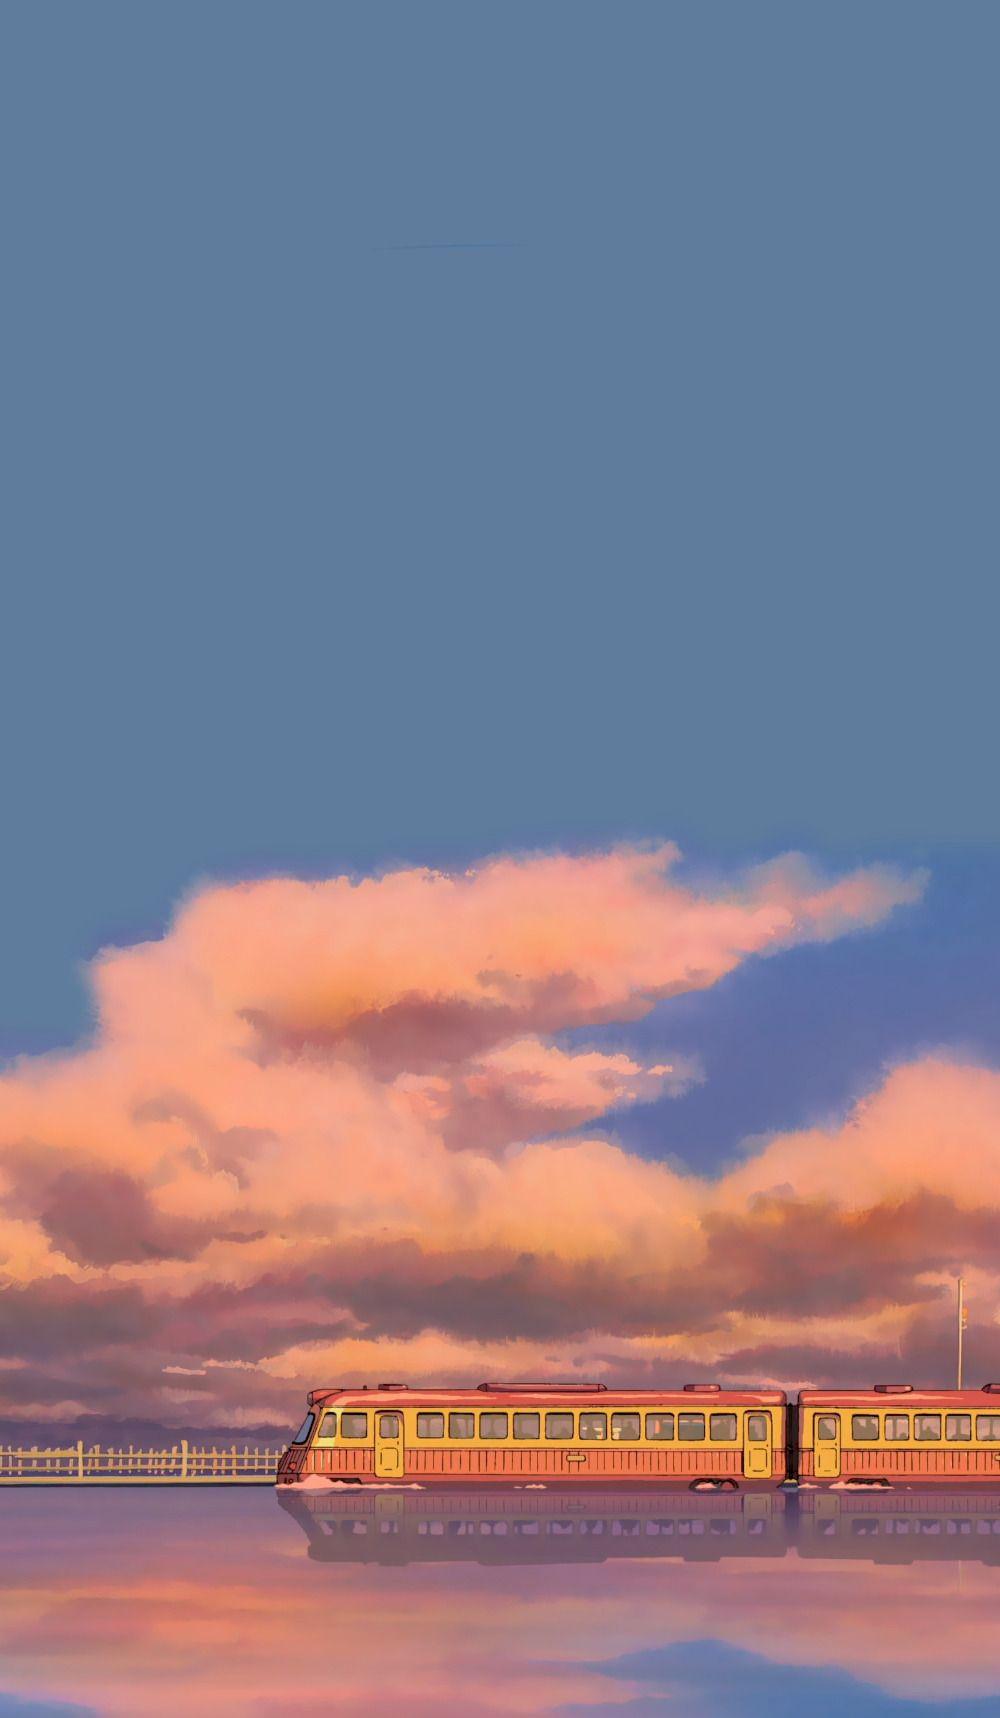 Howl S Moving Castle Tumblr Anime Scenery Wallpaper Studio Ghibli Background Scenery Wallpaper